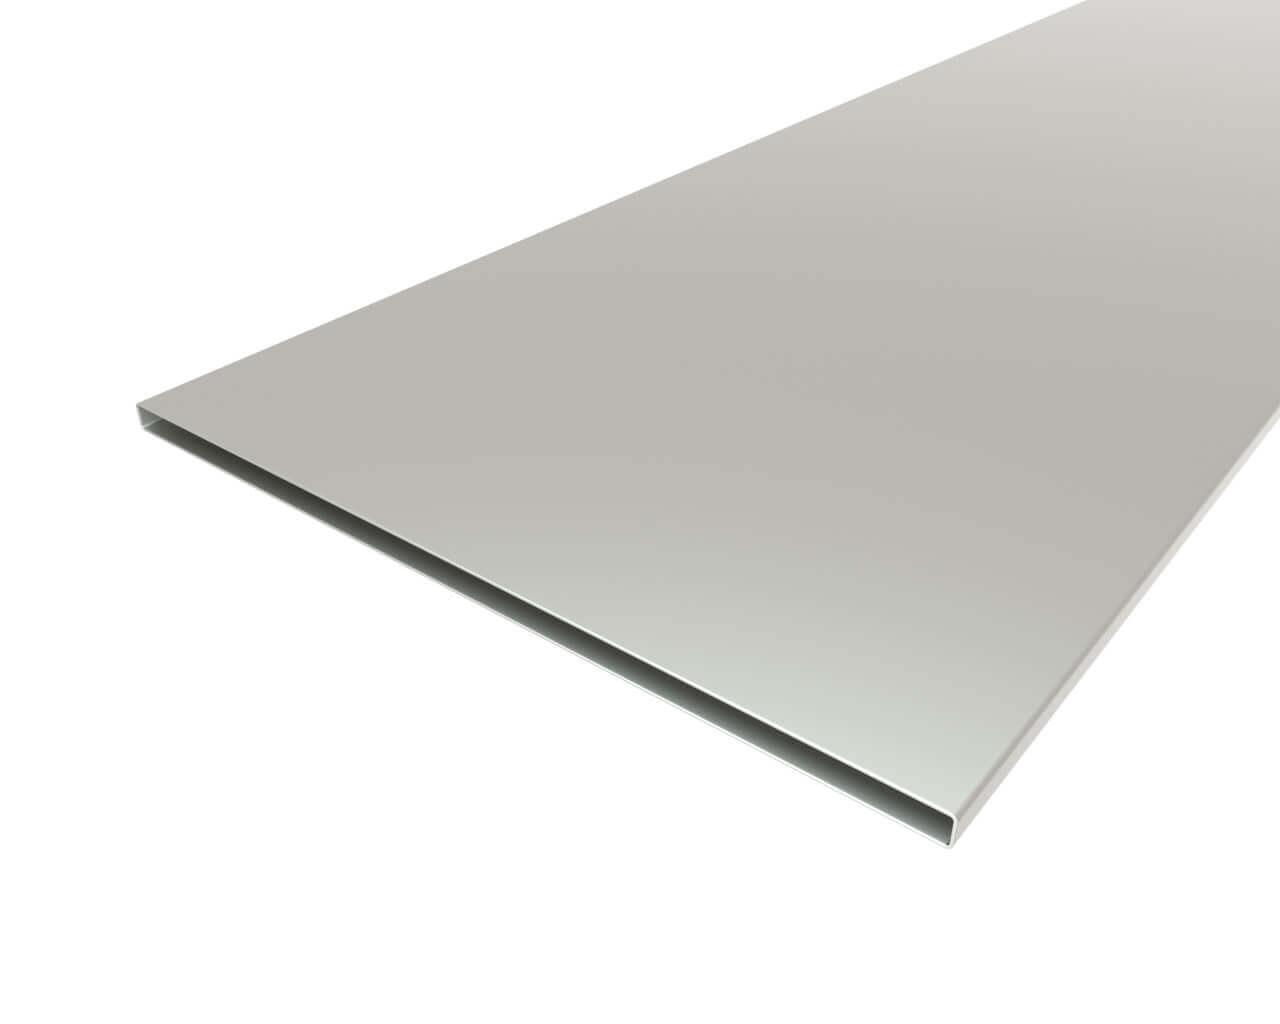 Алюминиевая пластина для ленты LC-AP-01650-2 anod